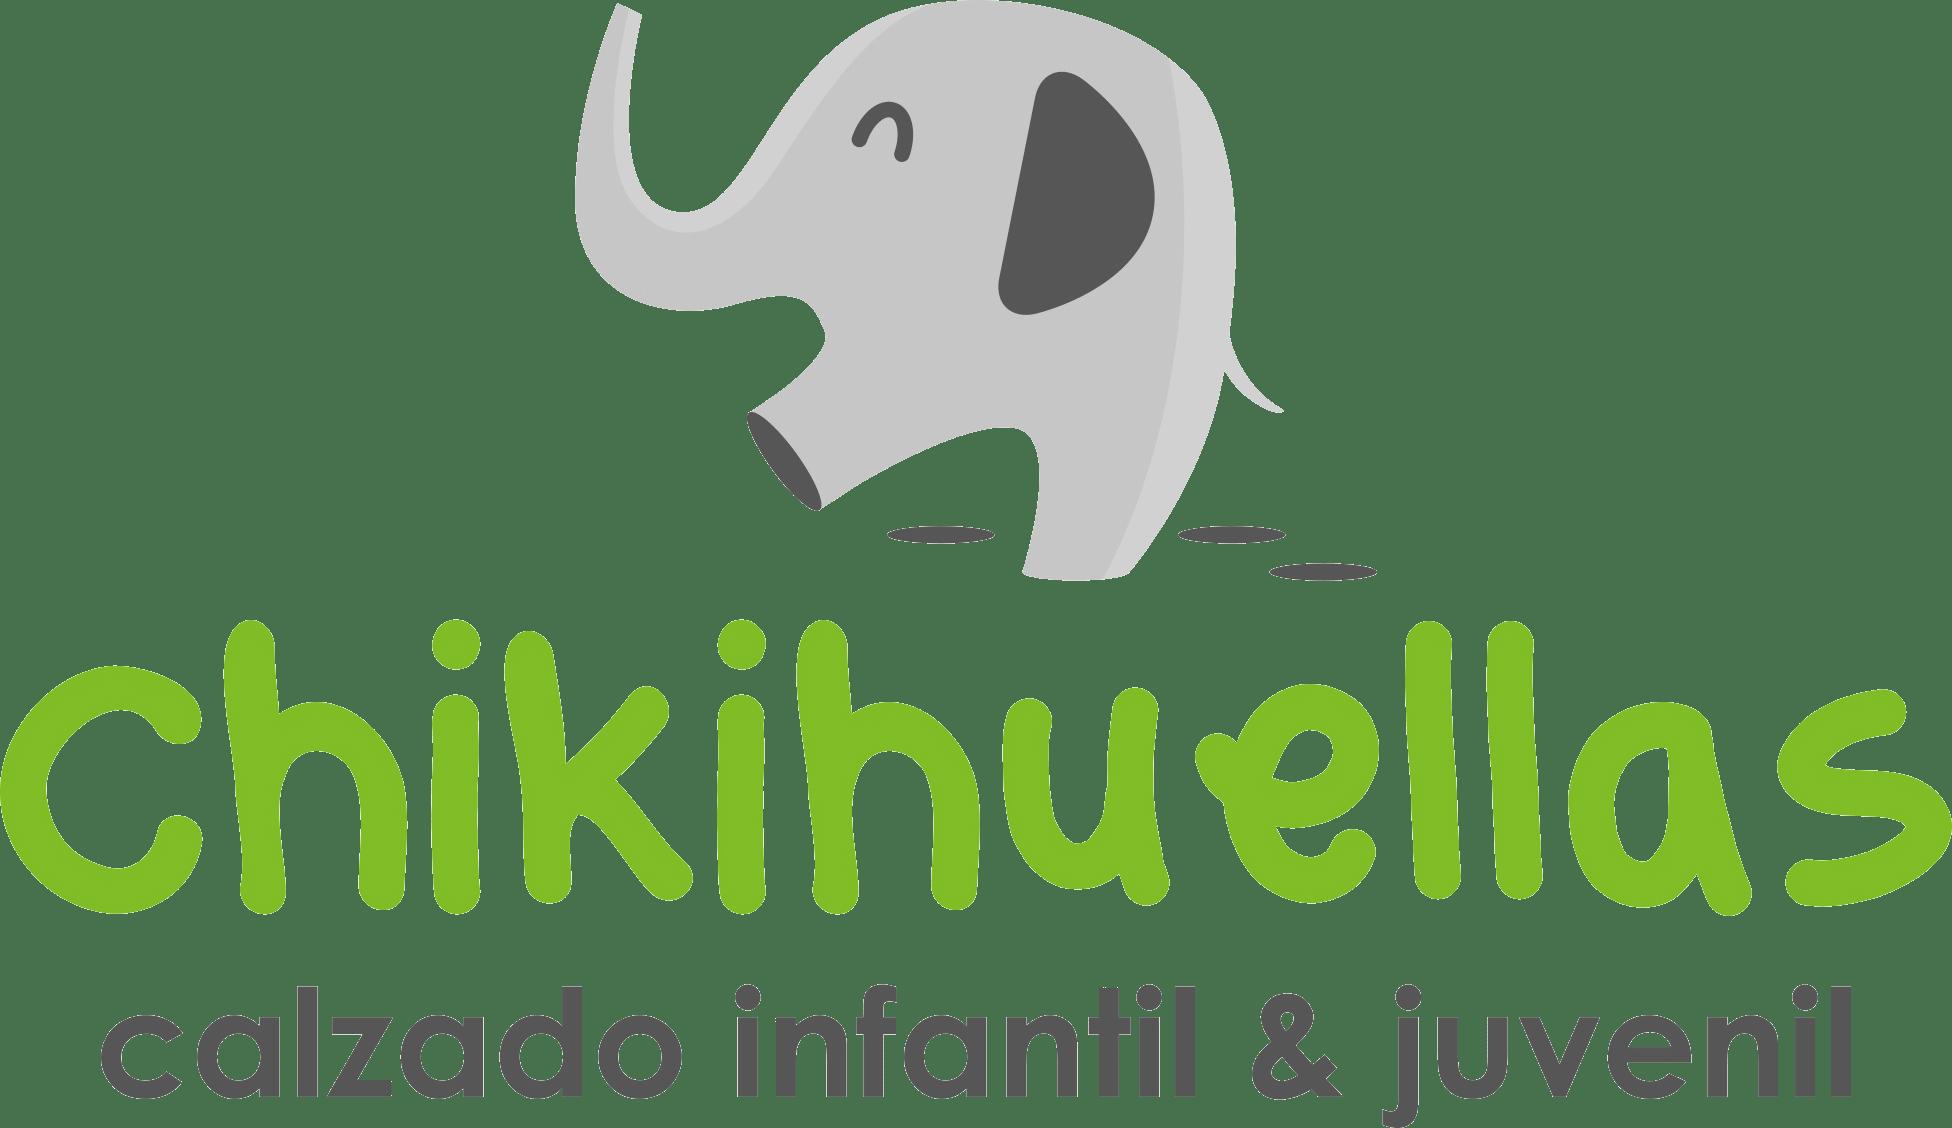 Logo Chikihuellas calzado infantil & juvenil